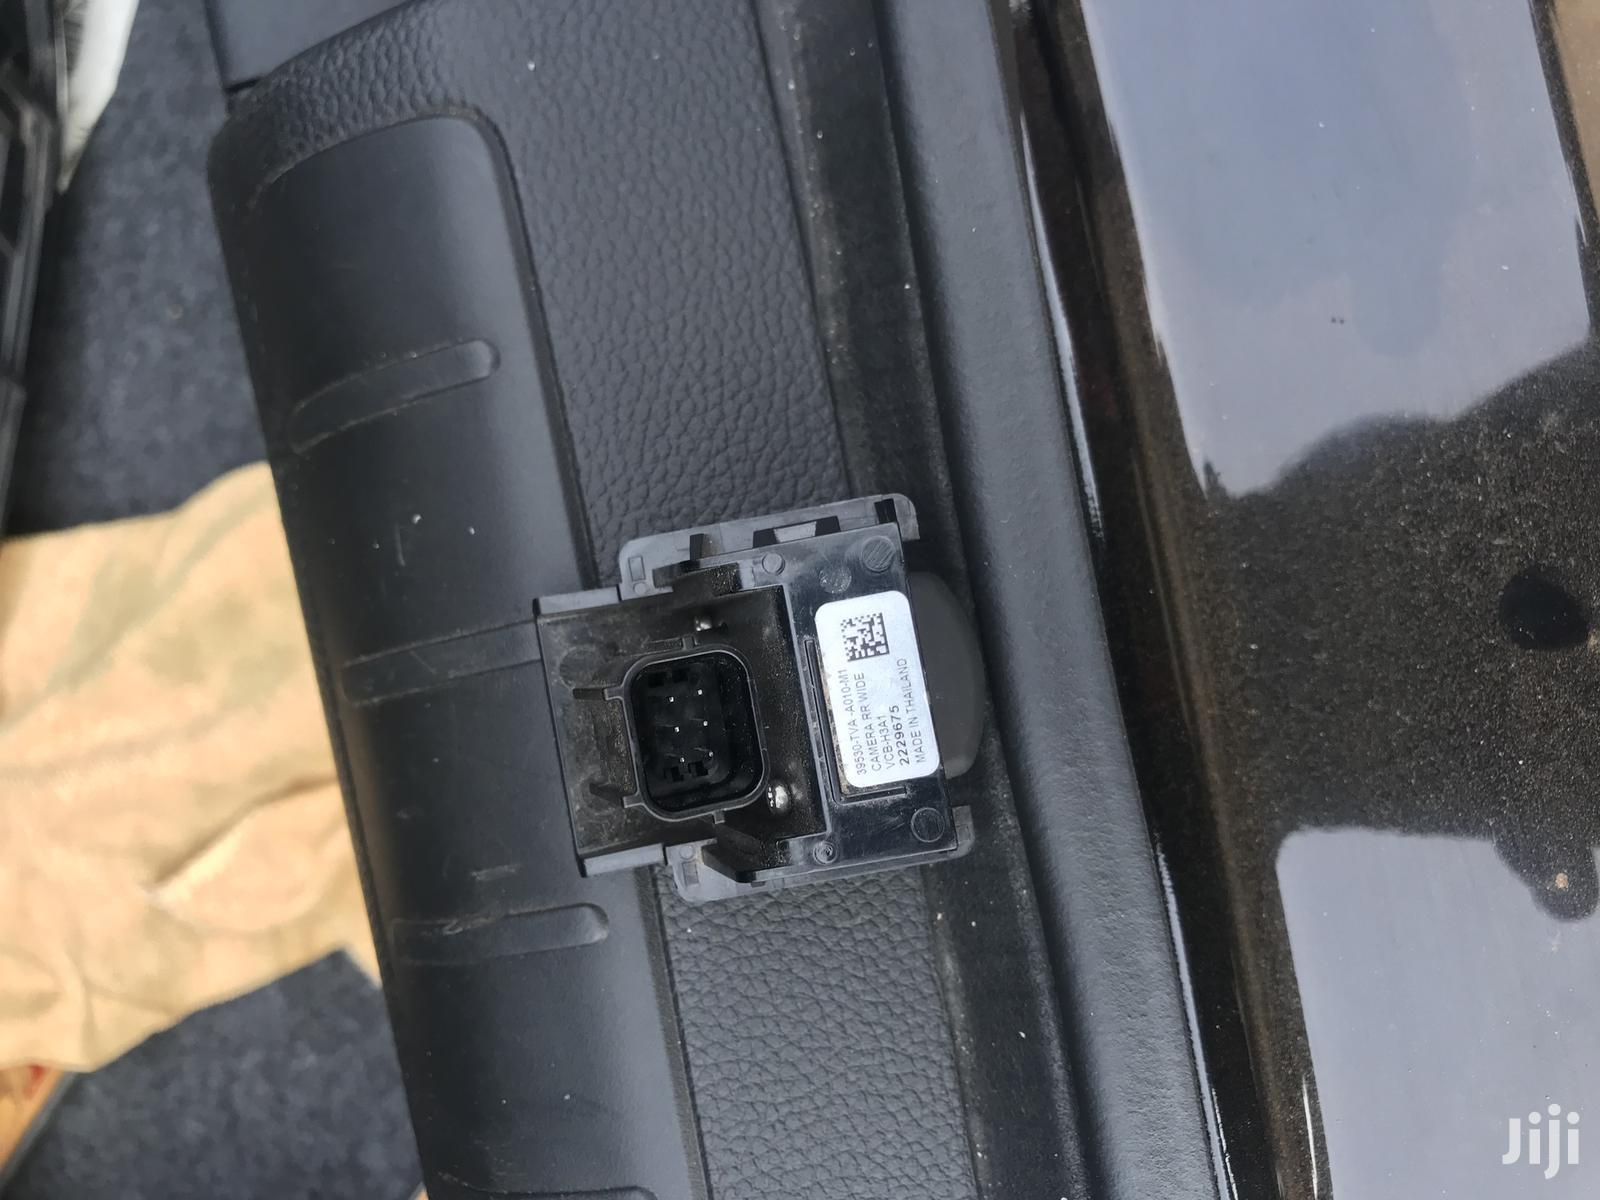 Honda Accord 2018 - 2019 Original Reverse Camera | Vehicle Parts & Accessories for sale in Darkuman, Greater Accra, Ghana